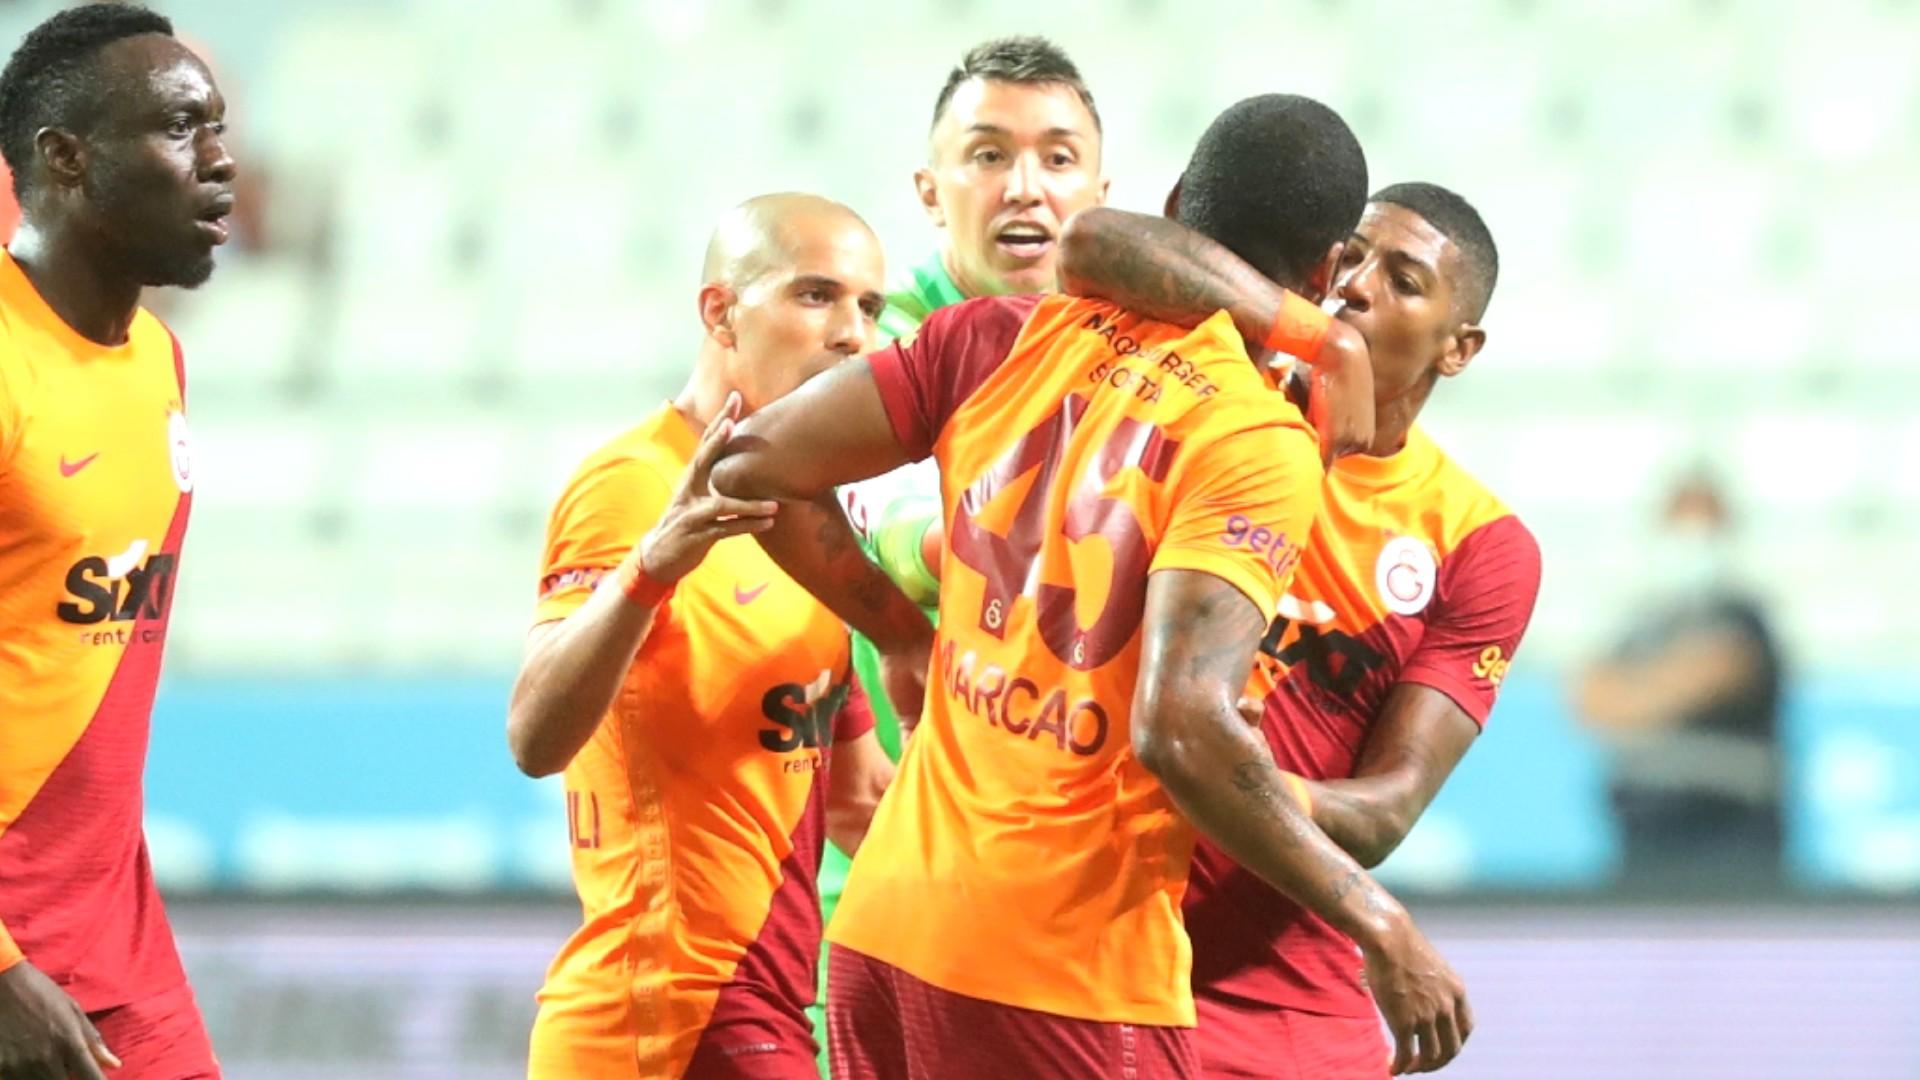 Galatasaray's Marcao